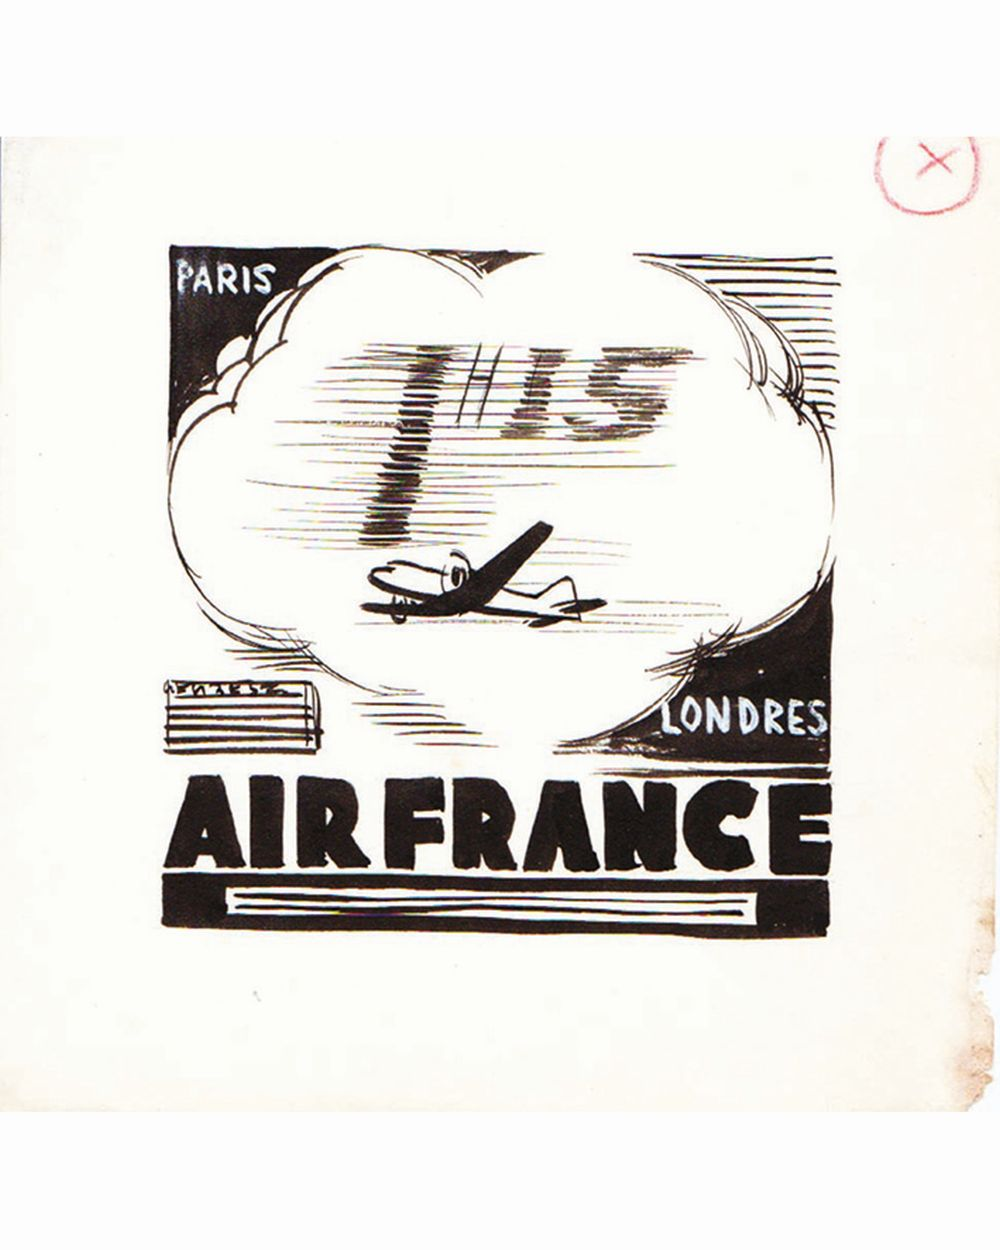 DOOB - Paris Londres 1 h 15 Air France dessin à l'encre de chinedrawing in china ink unic piece     1938